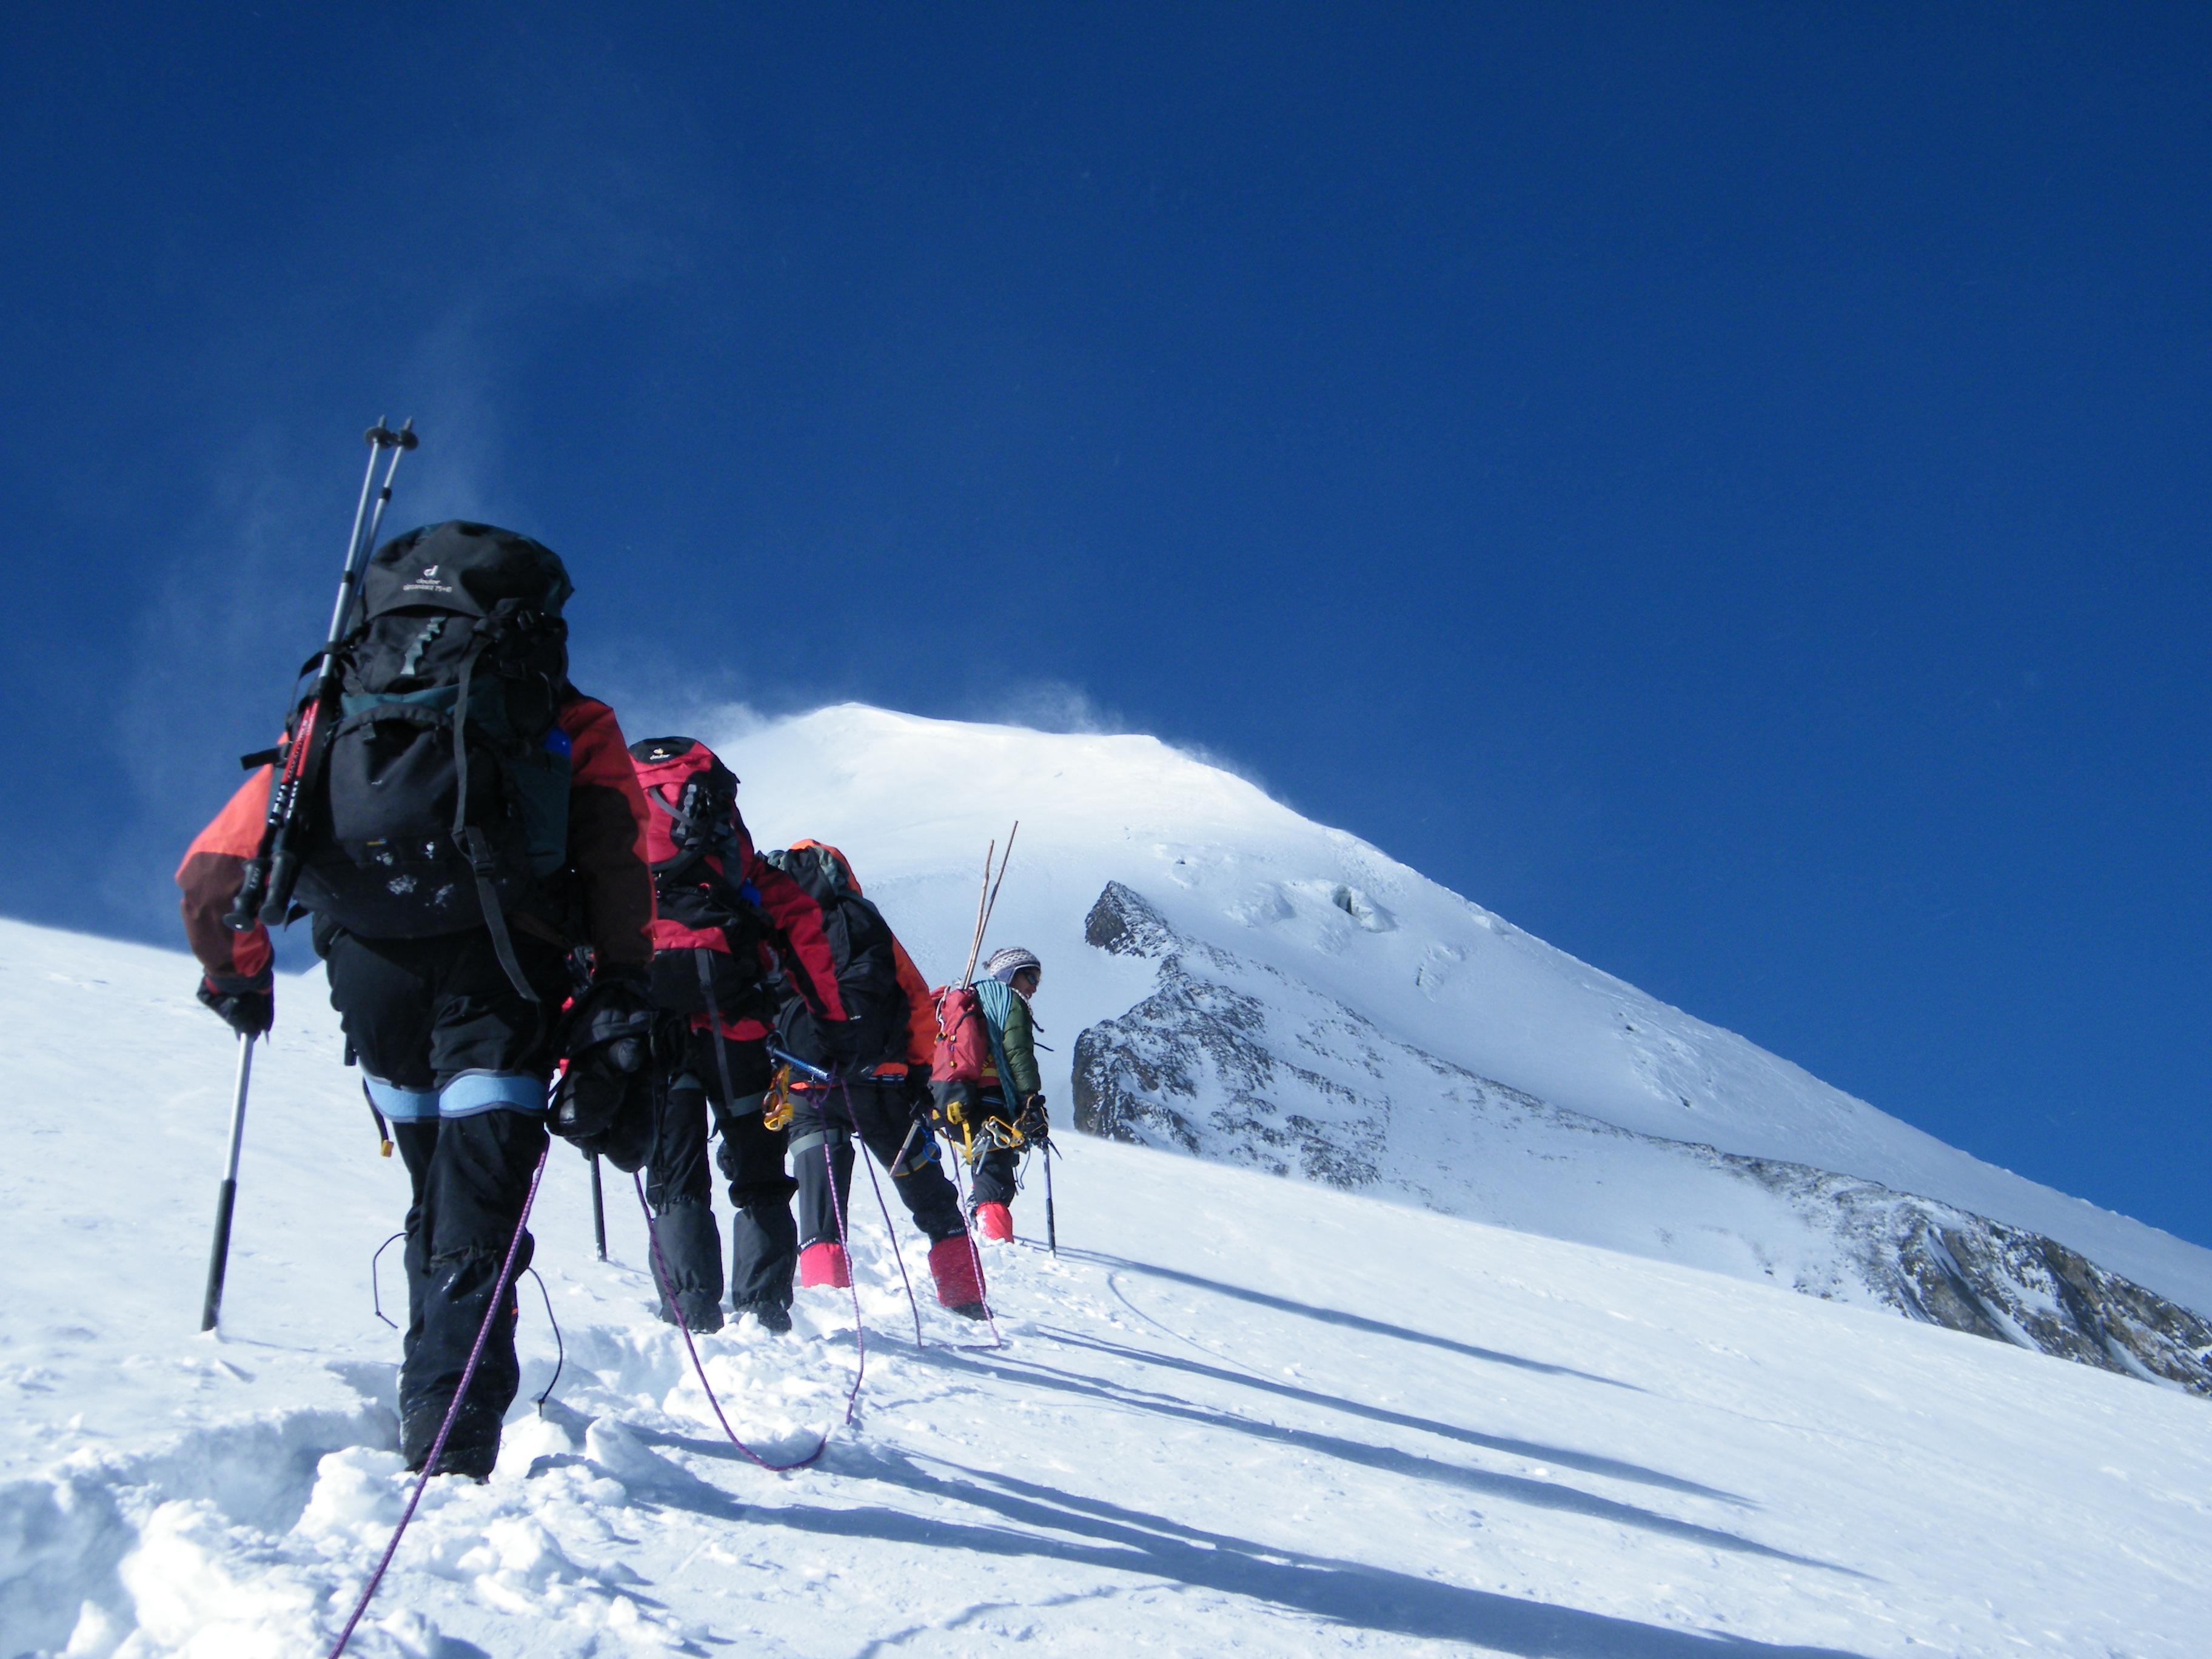 ski-alpinisme-montagne- neige-hiver-millet